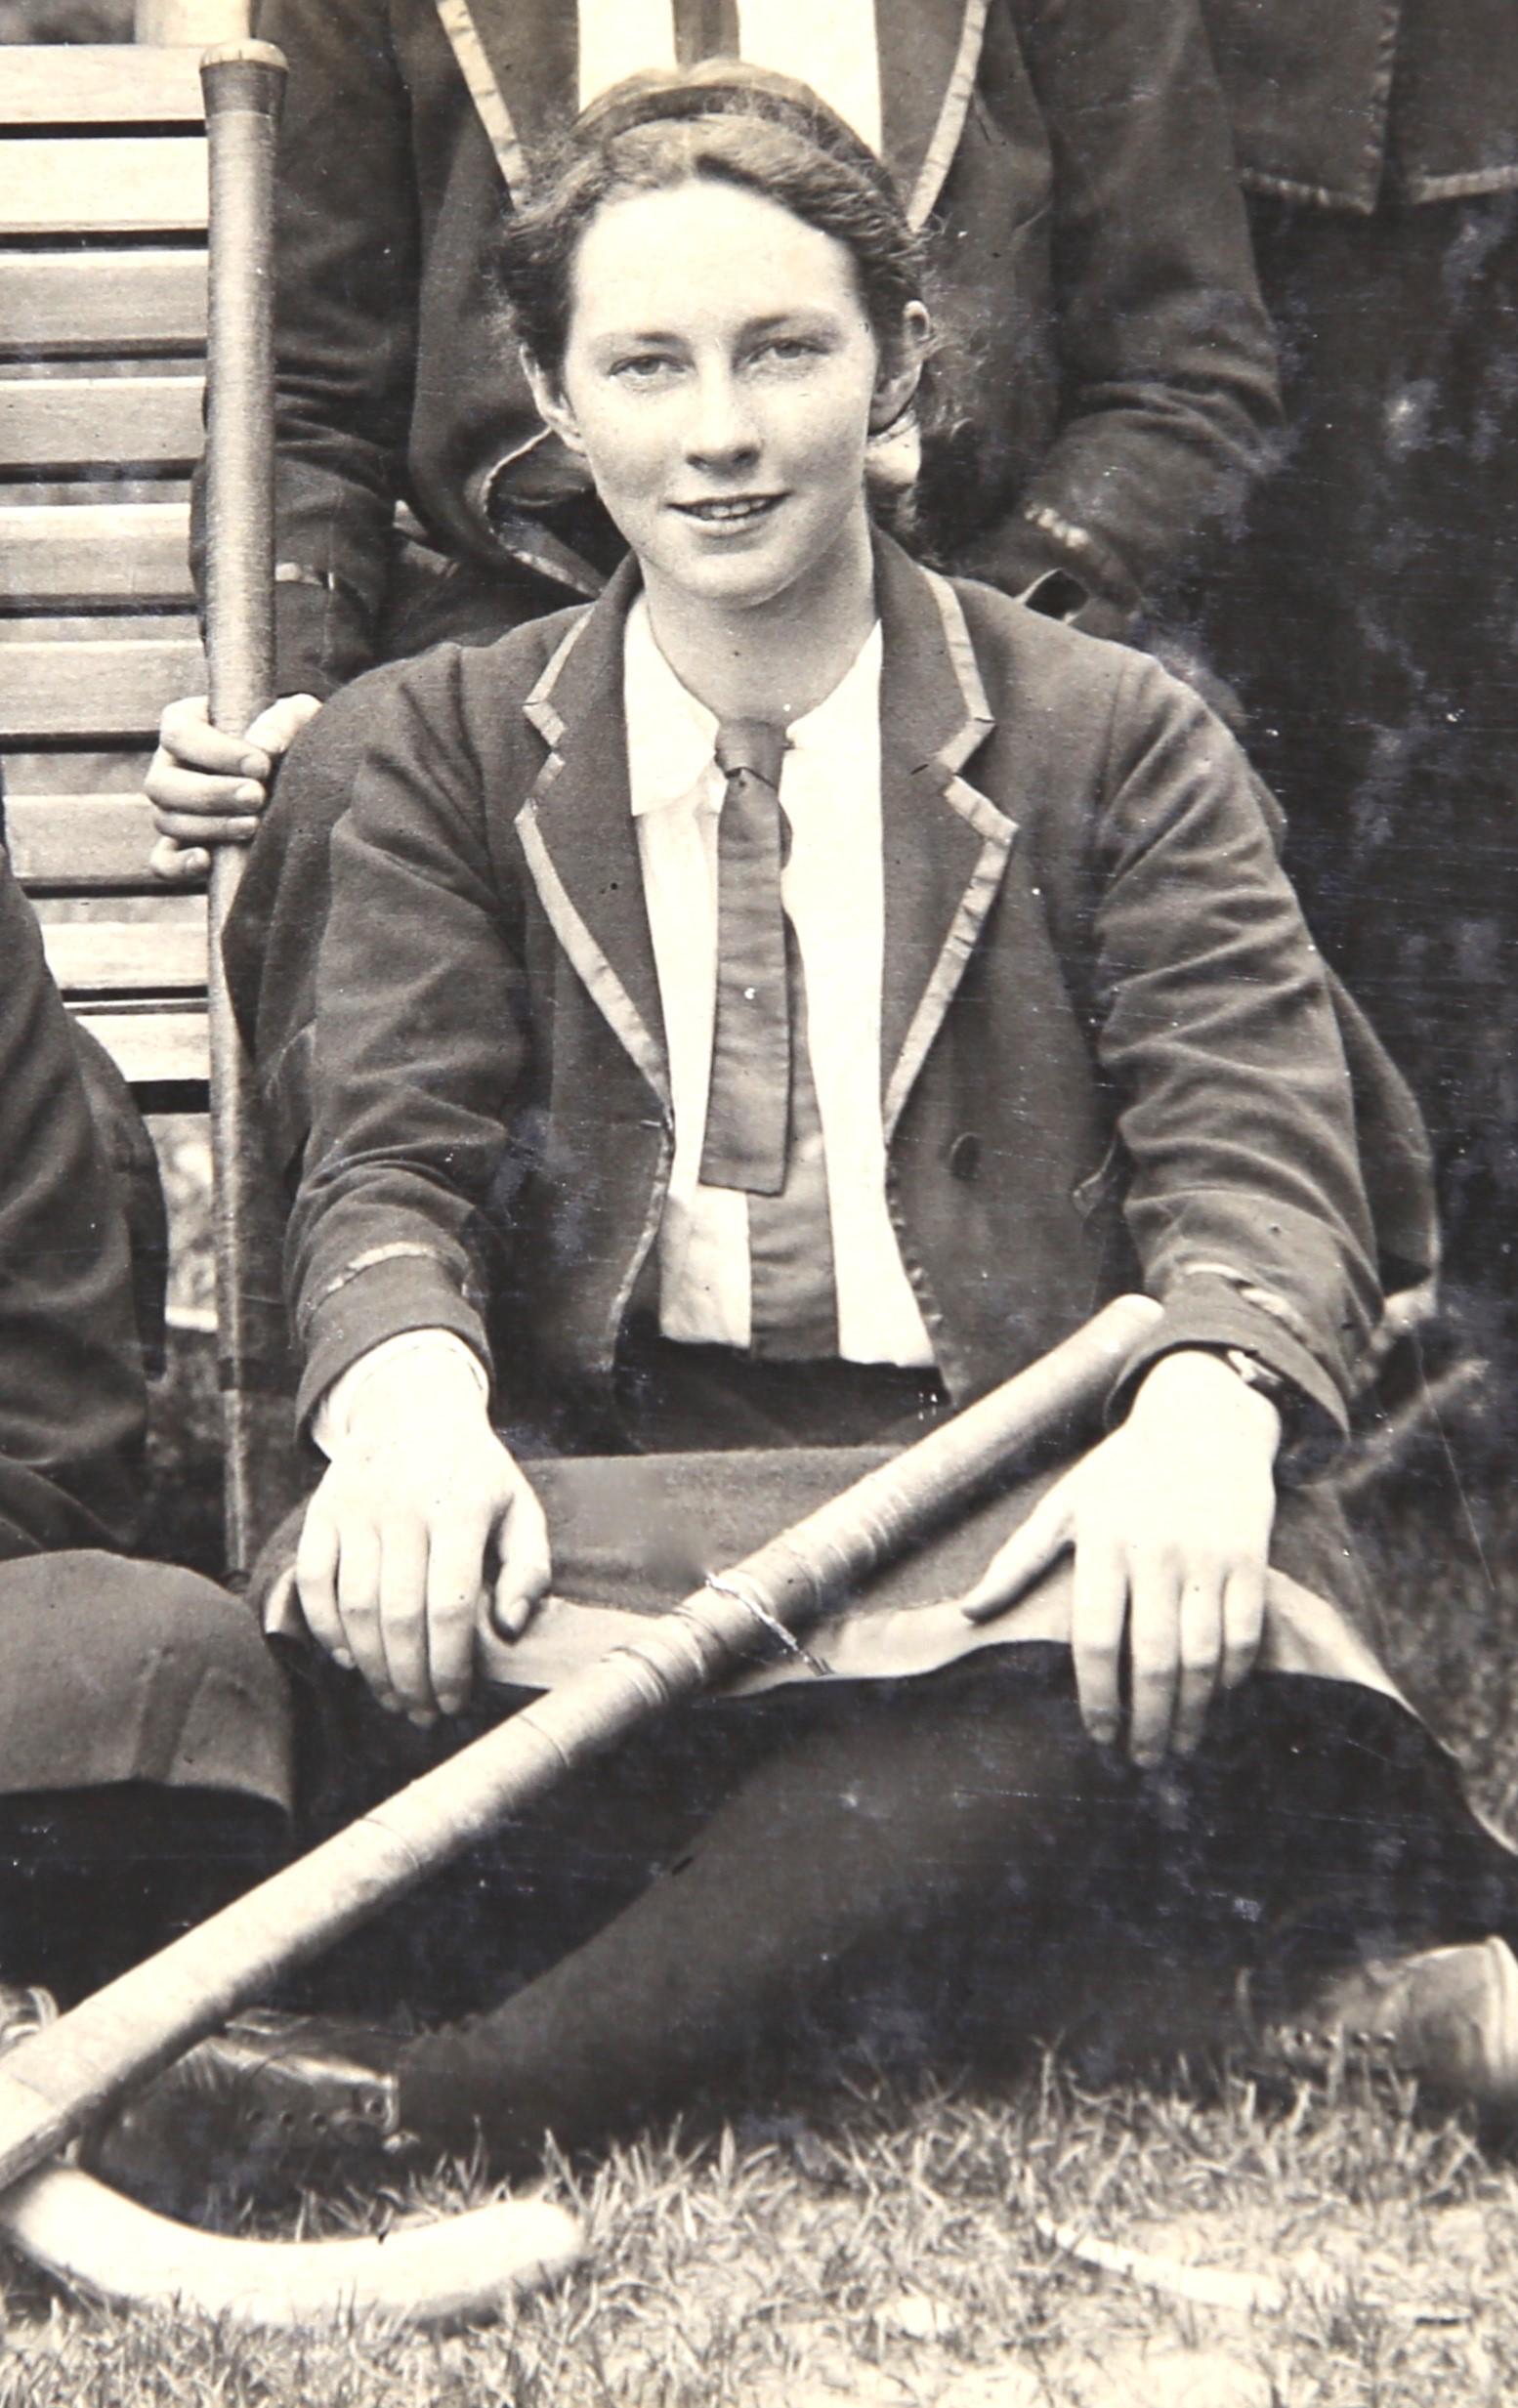 Ileen Macpherson, hockey team, Clyde School Archives, Image supplied by John Paull.